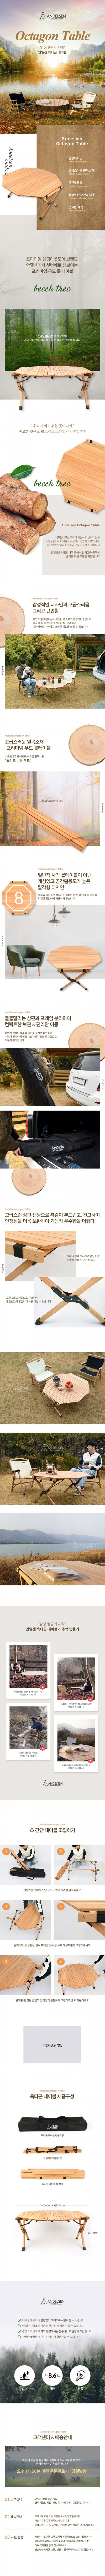 [D129]캠핑 상세페이지 제작 + 촬영